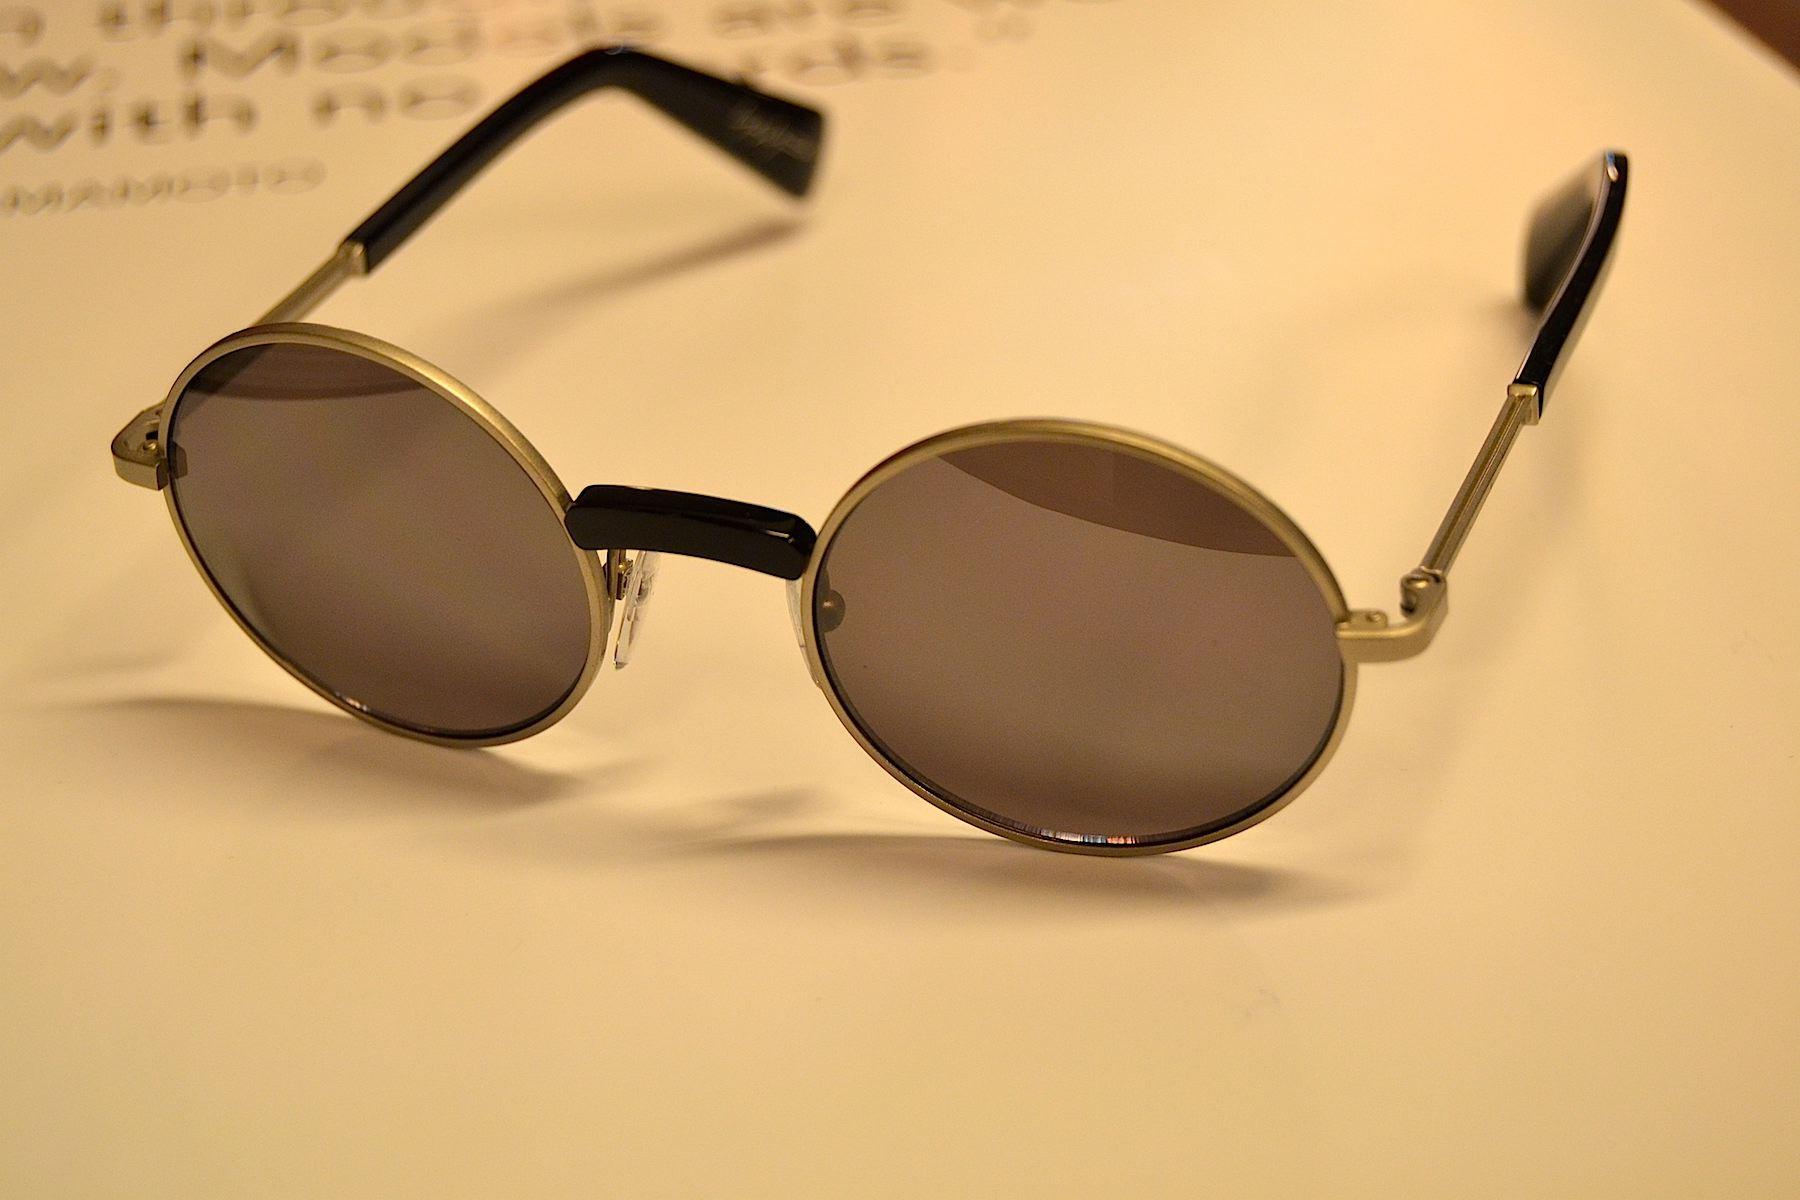 lenastore-bergamo-lenafashion-shop-online-yohji-yamamoto-gli-occhiali-sunglasses-8